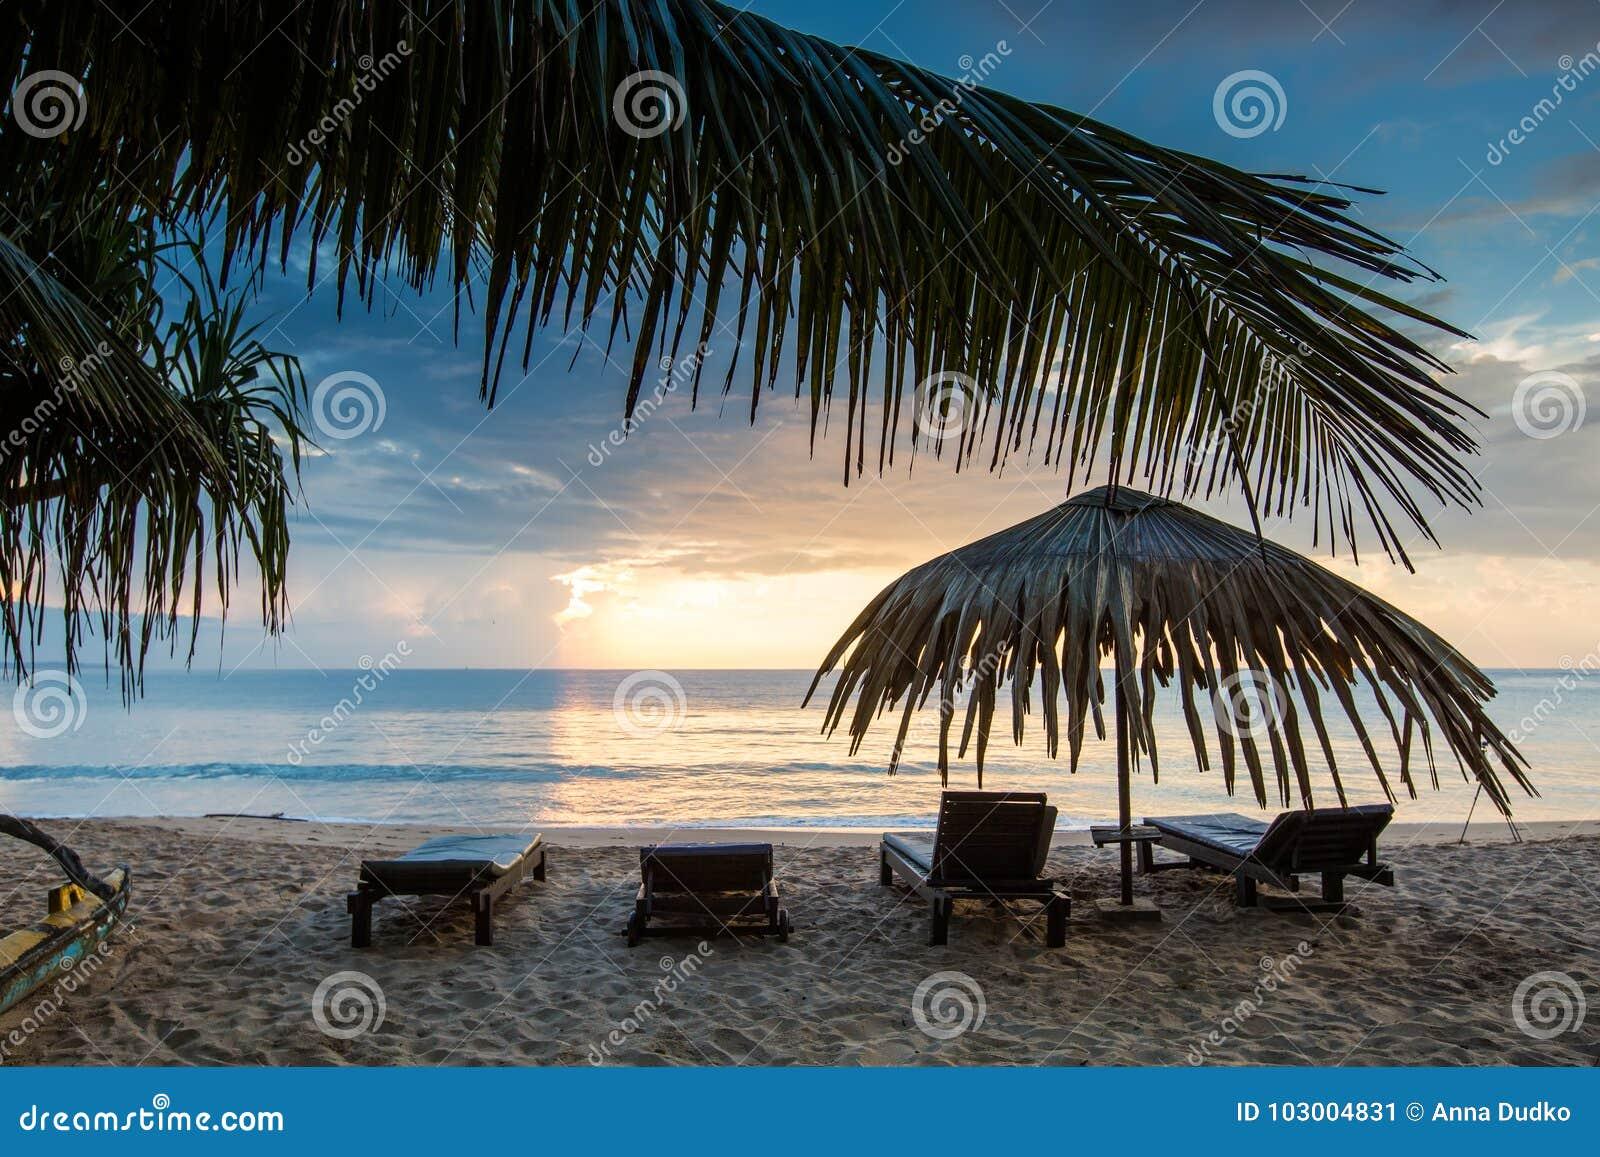 Sun loungers with umbrella on the beach, sunset